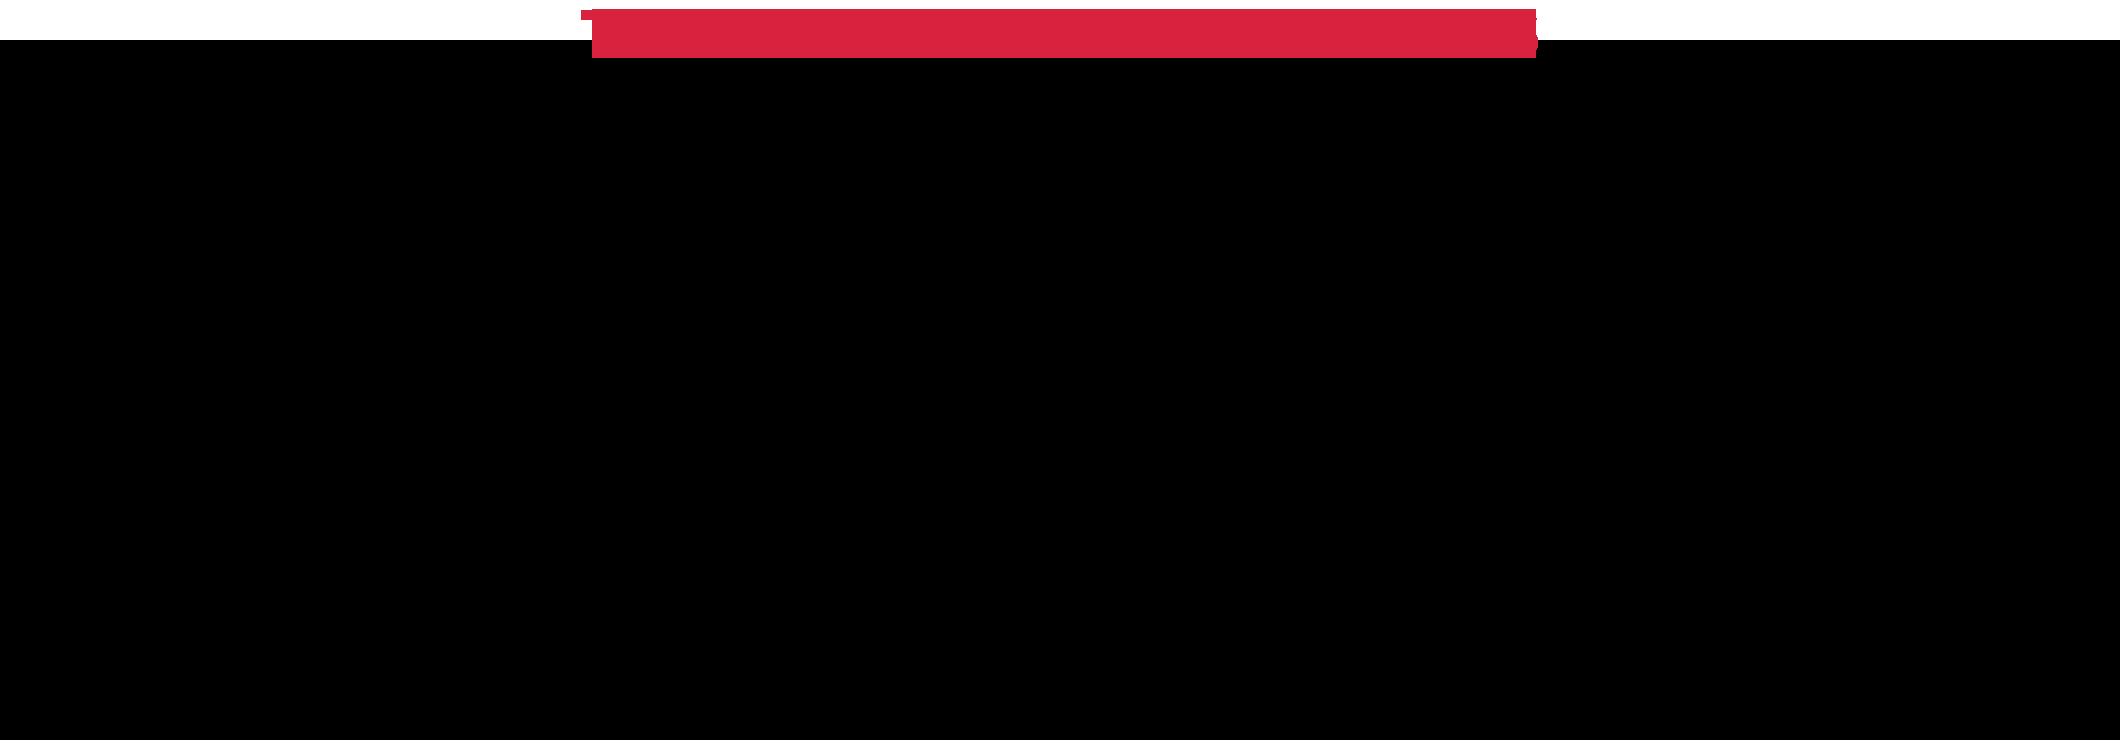 Vratim Drum Shoe Size Chart 2020